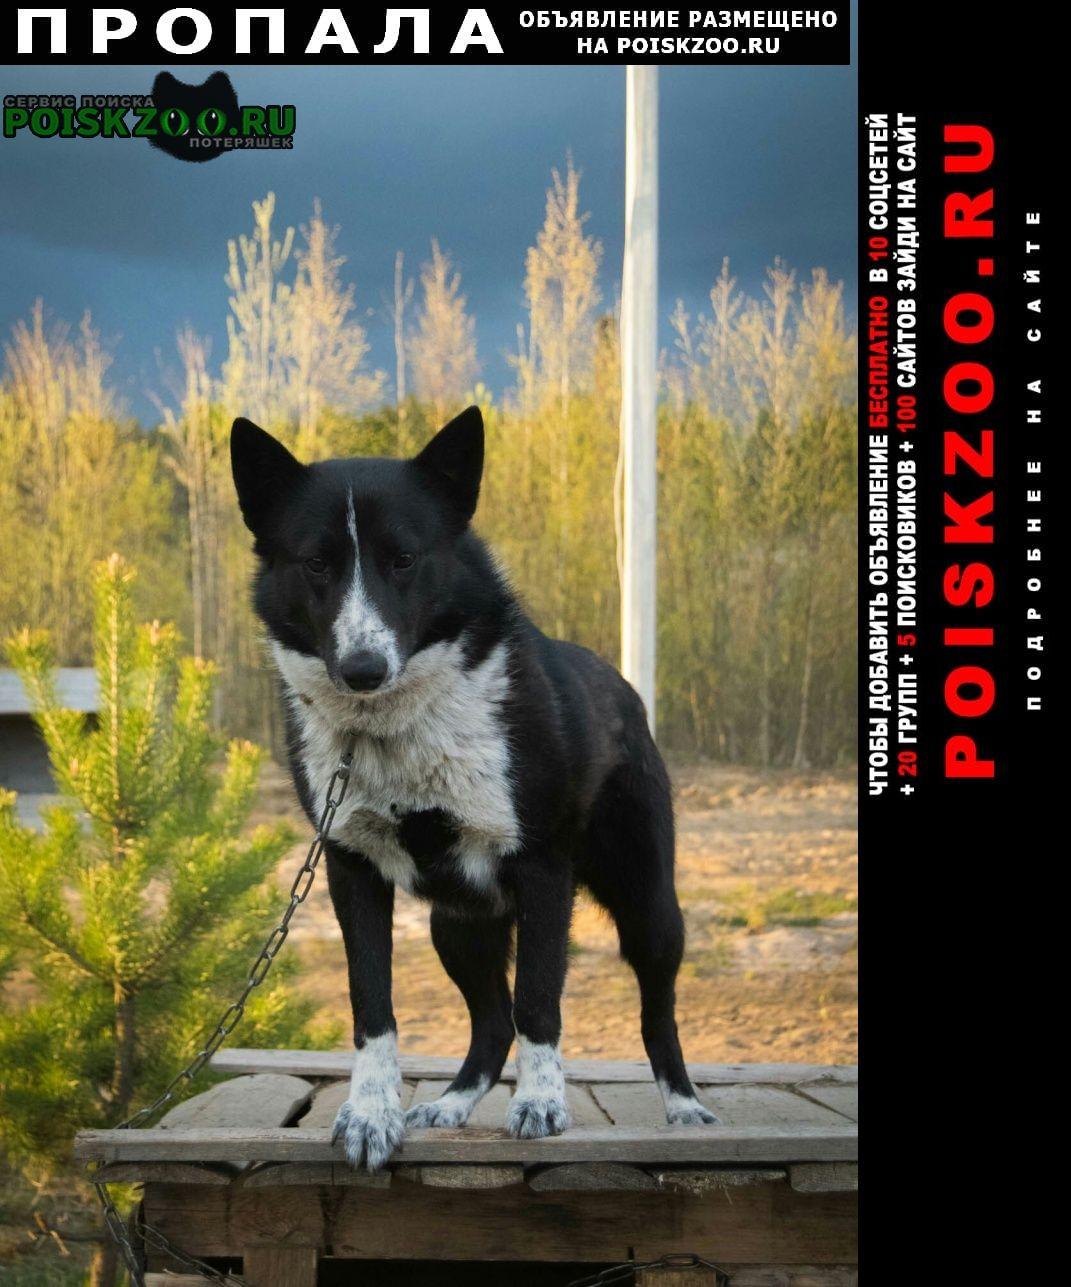 Пропала собака кобель Ломоносов